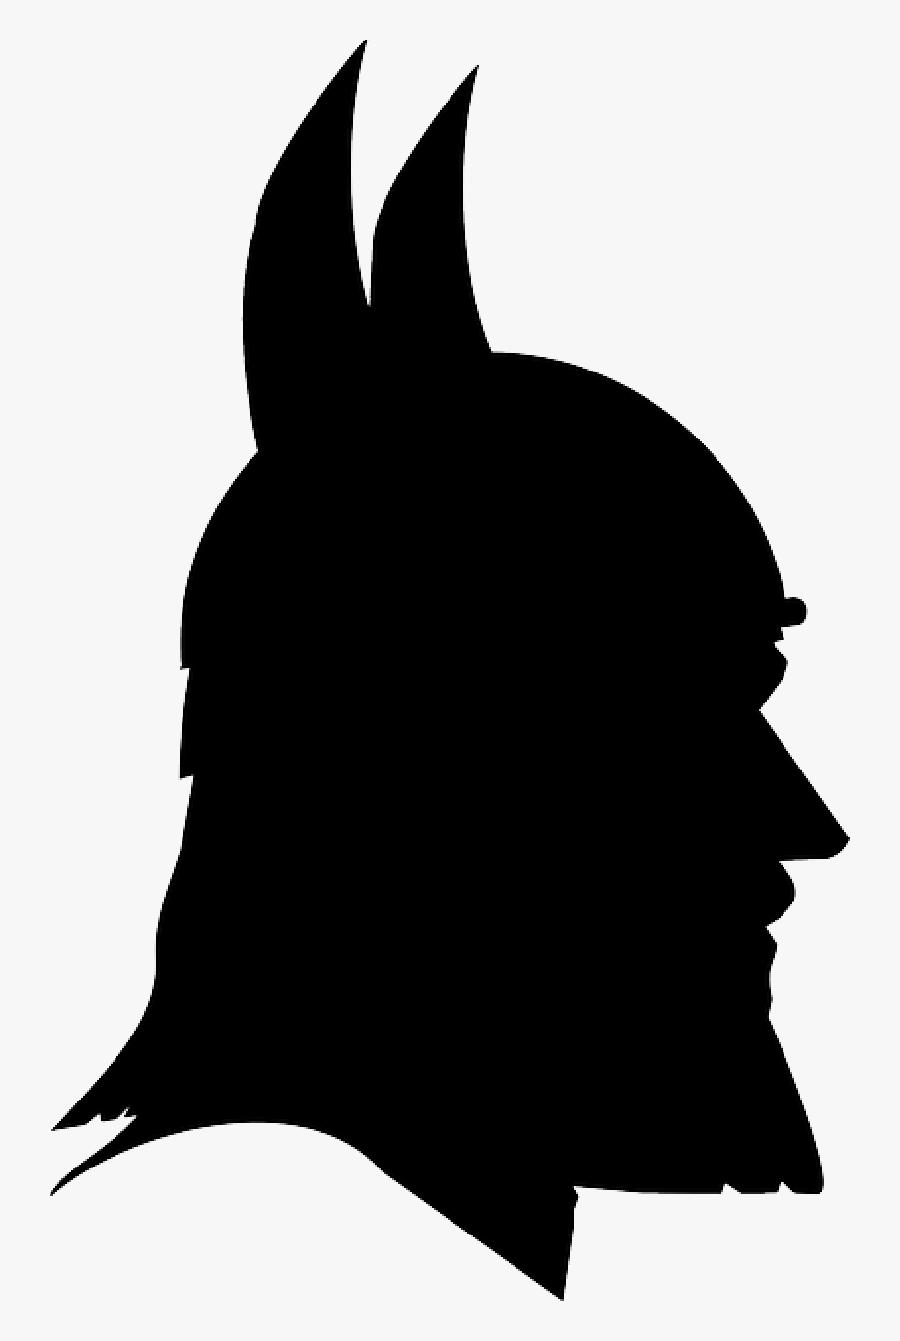 Portrait, Man, Profile, Norse, Viking, Warrior - Silhouette Of A Viking, Transparent Clipart